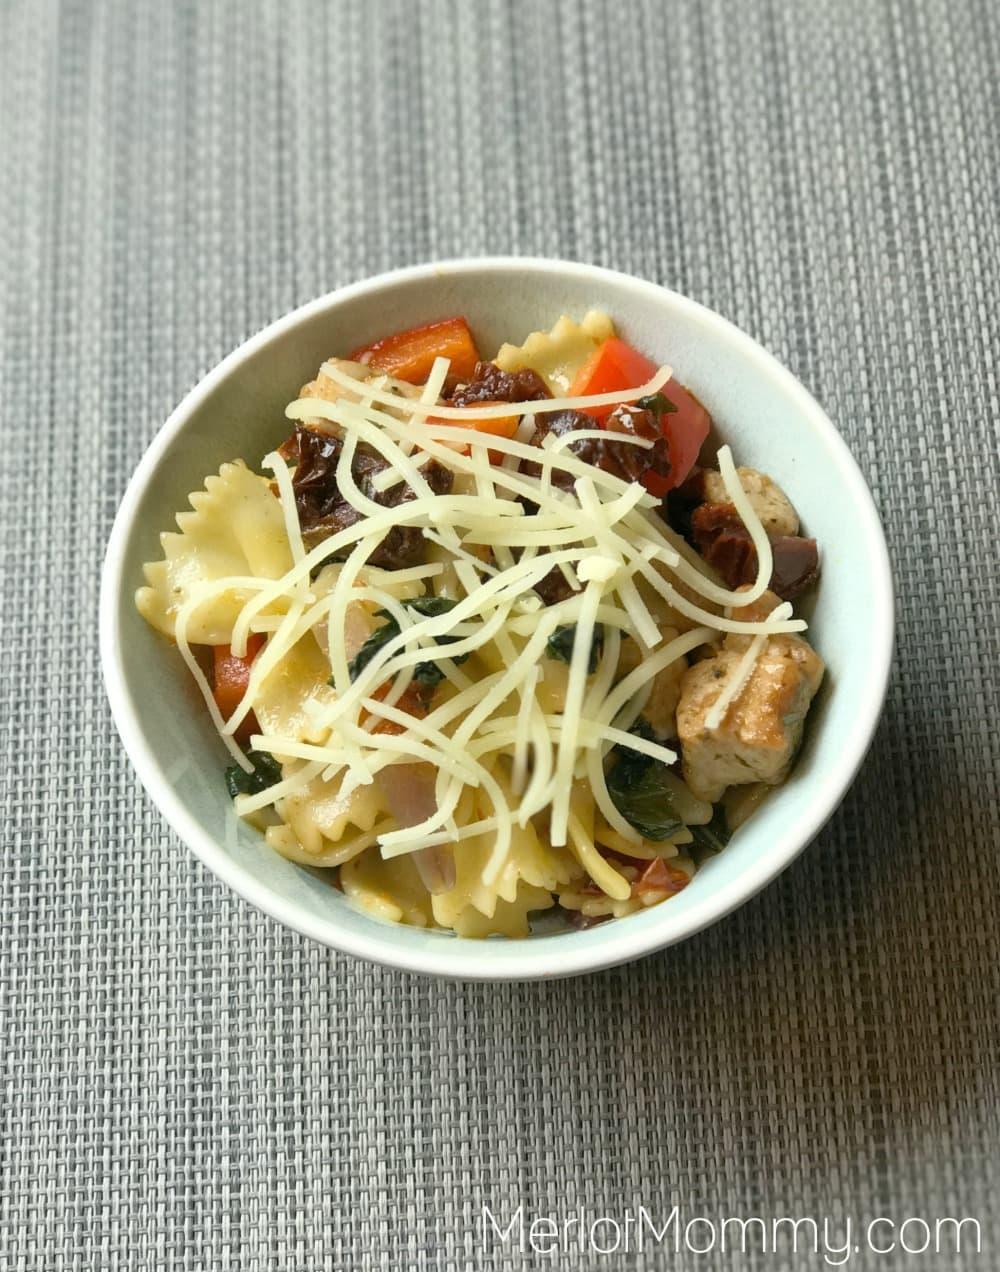 Italian Pasta and Pork Stir Fry